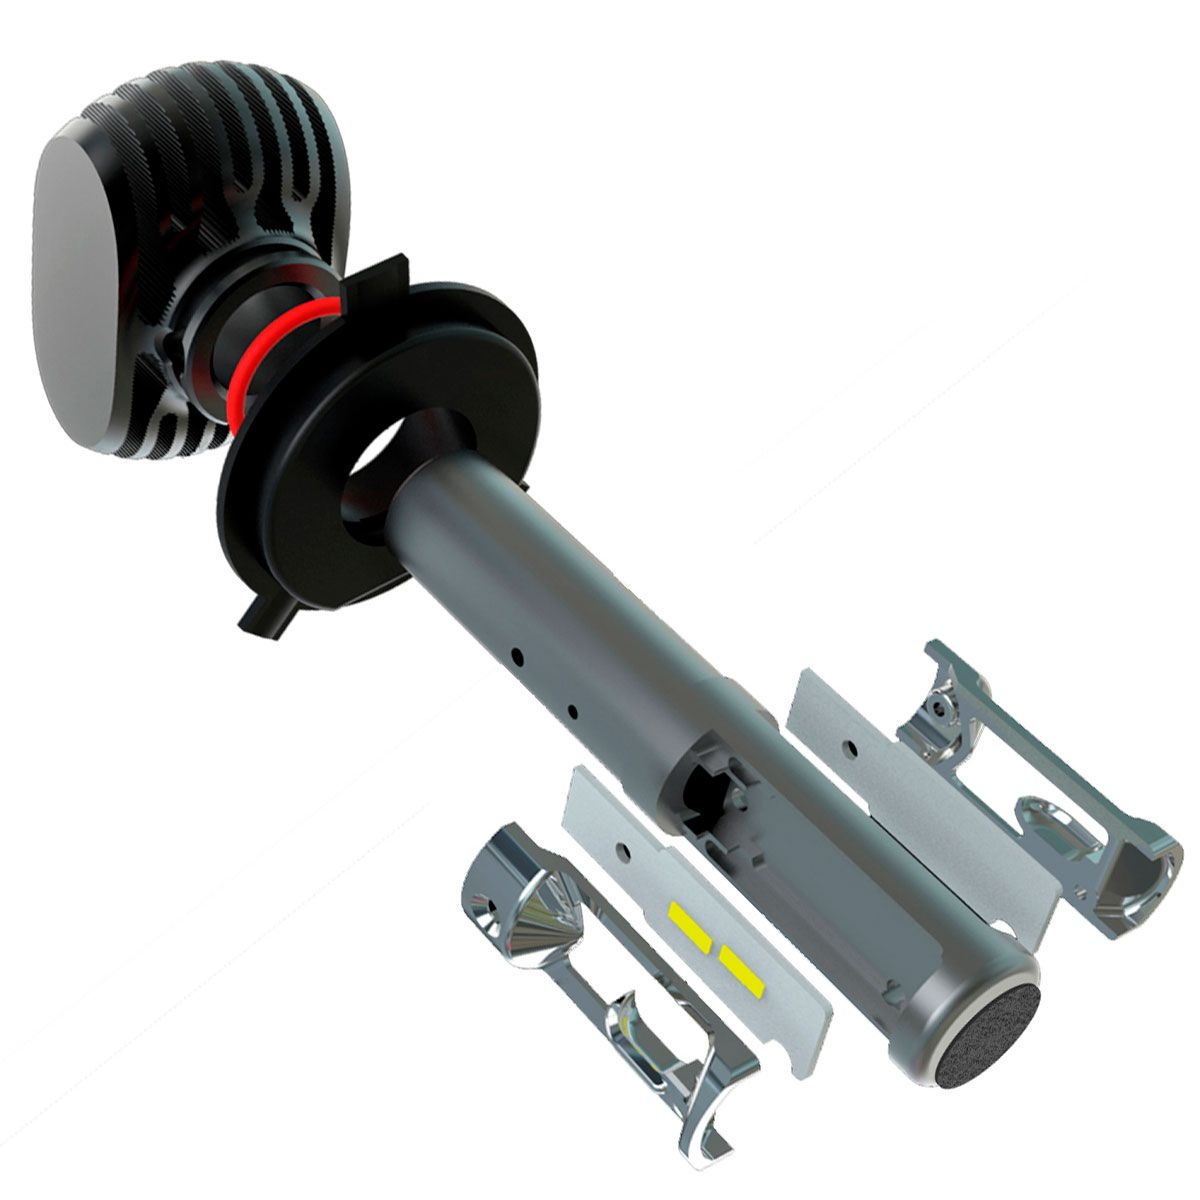 Kit Ultra LED Gol G3 farol duplo 2000 2001 2002 2003 2004 2005 tipo xenon farol alto H1 50W